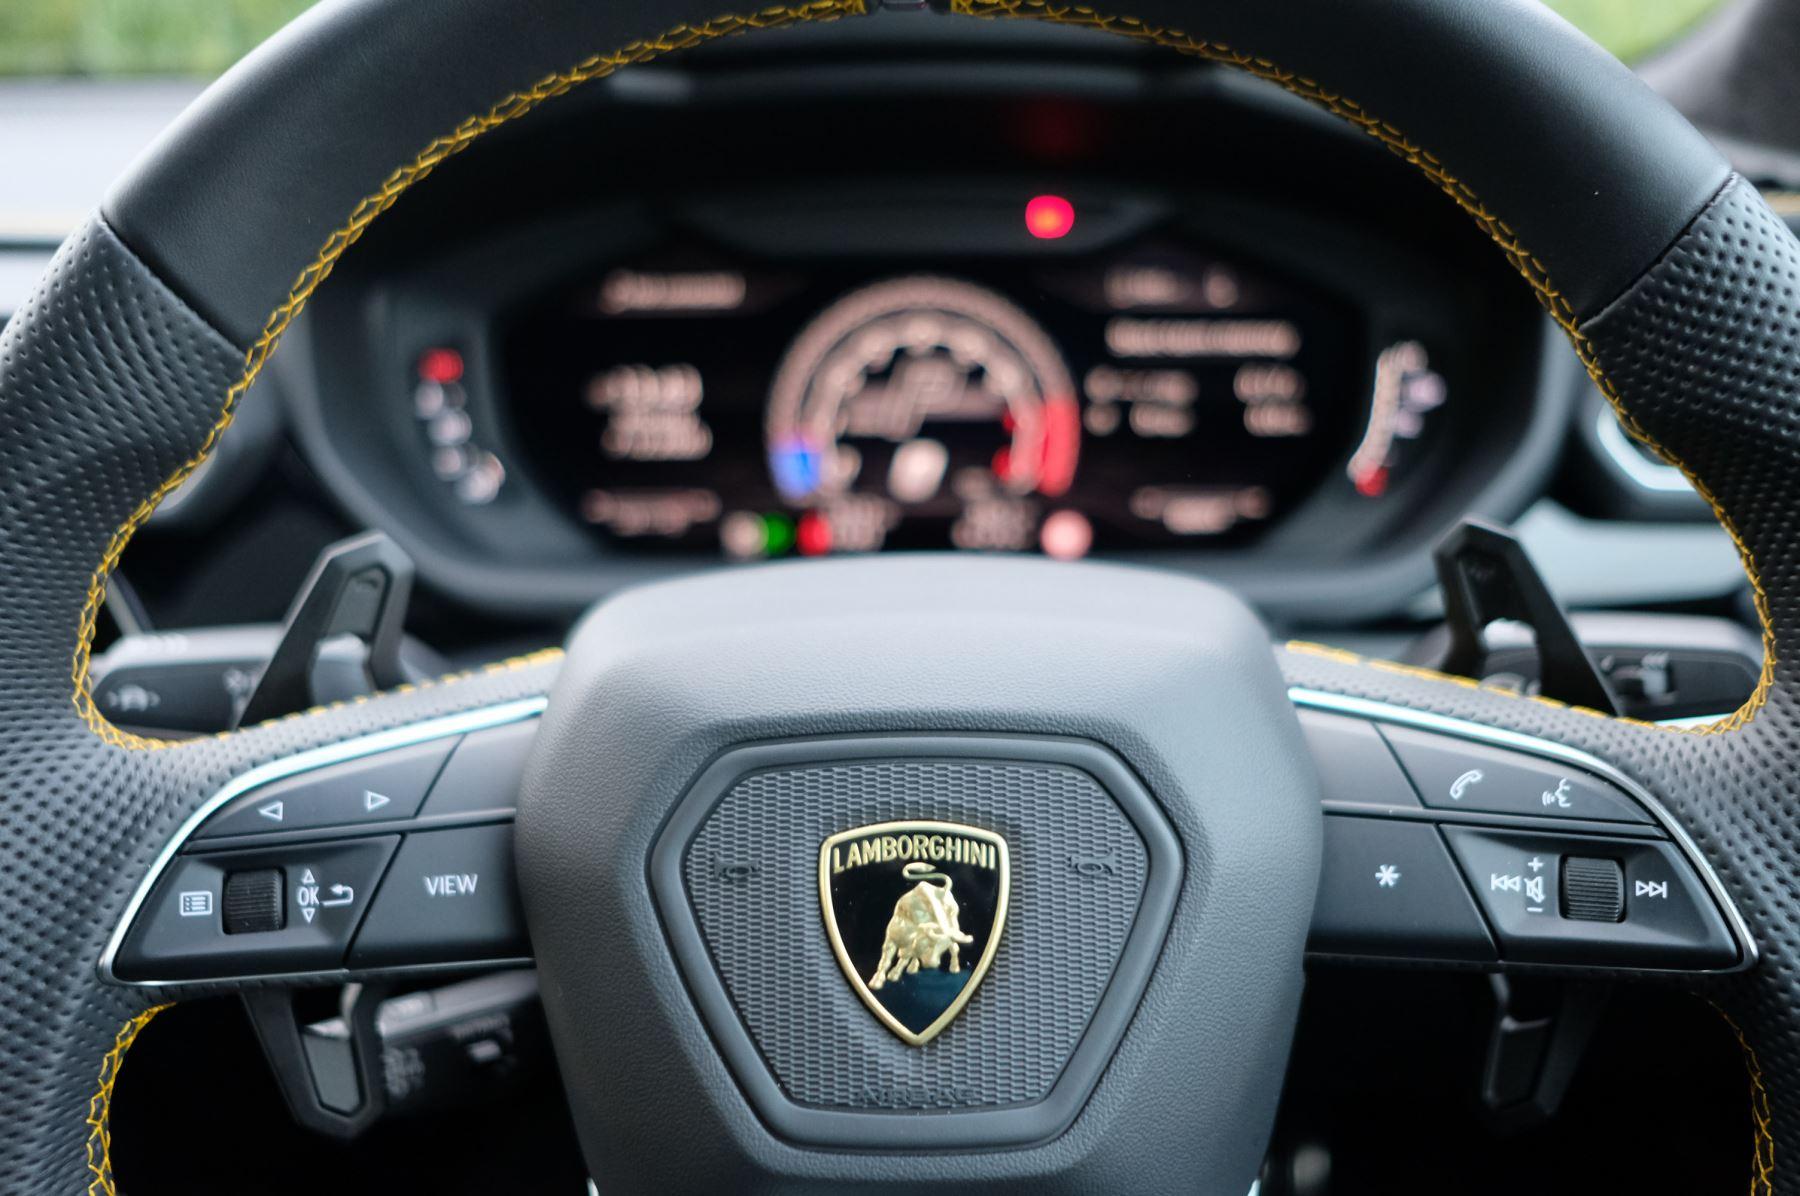 Lamborghini Urus 4.0T FSI V8 5dr Auto - Akrapovic exhaust & Exterior Carbon image 25